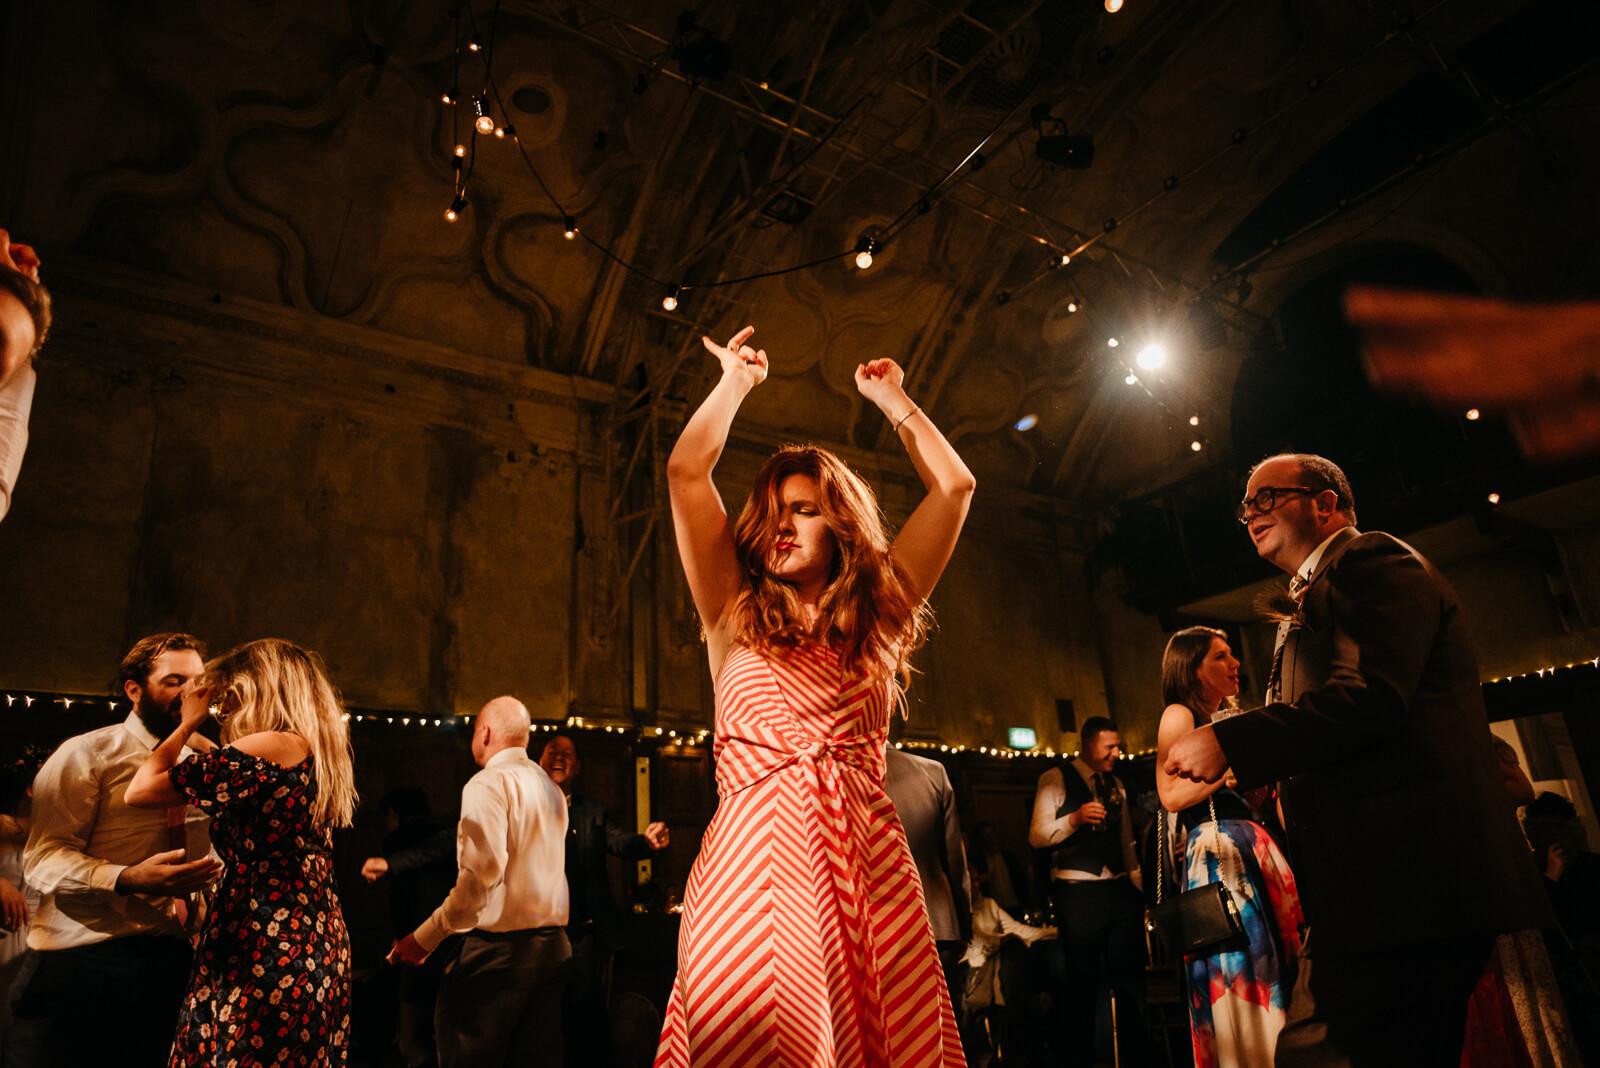 happy guests enjoying the music dancing at Battersea Arts Centre